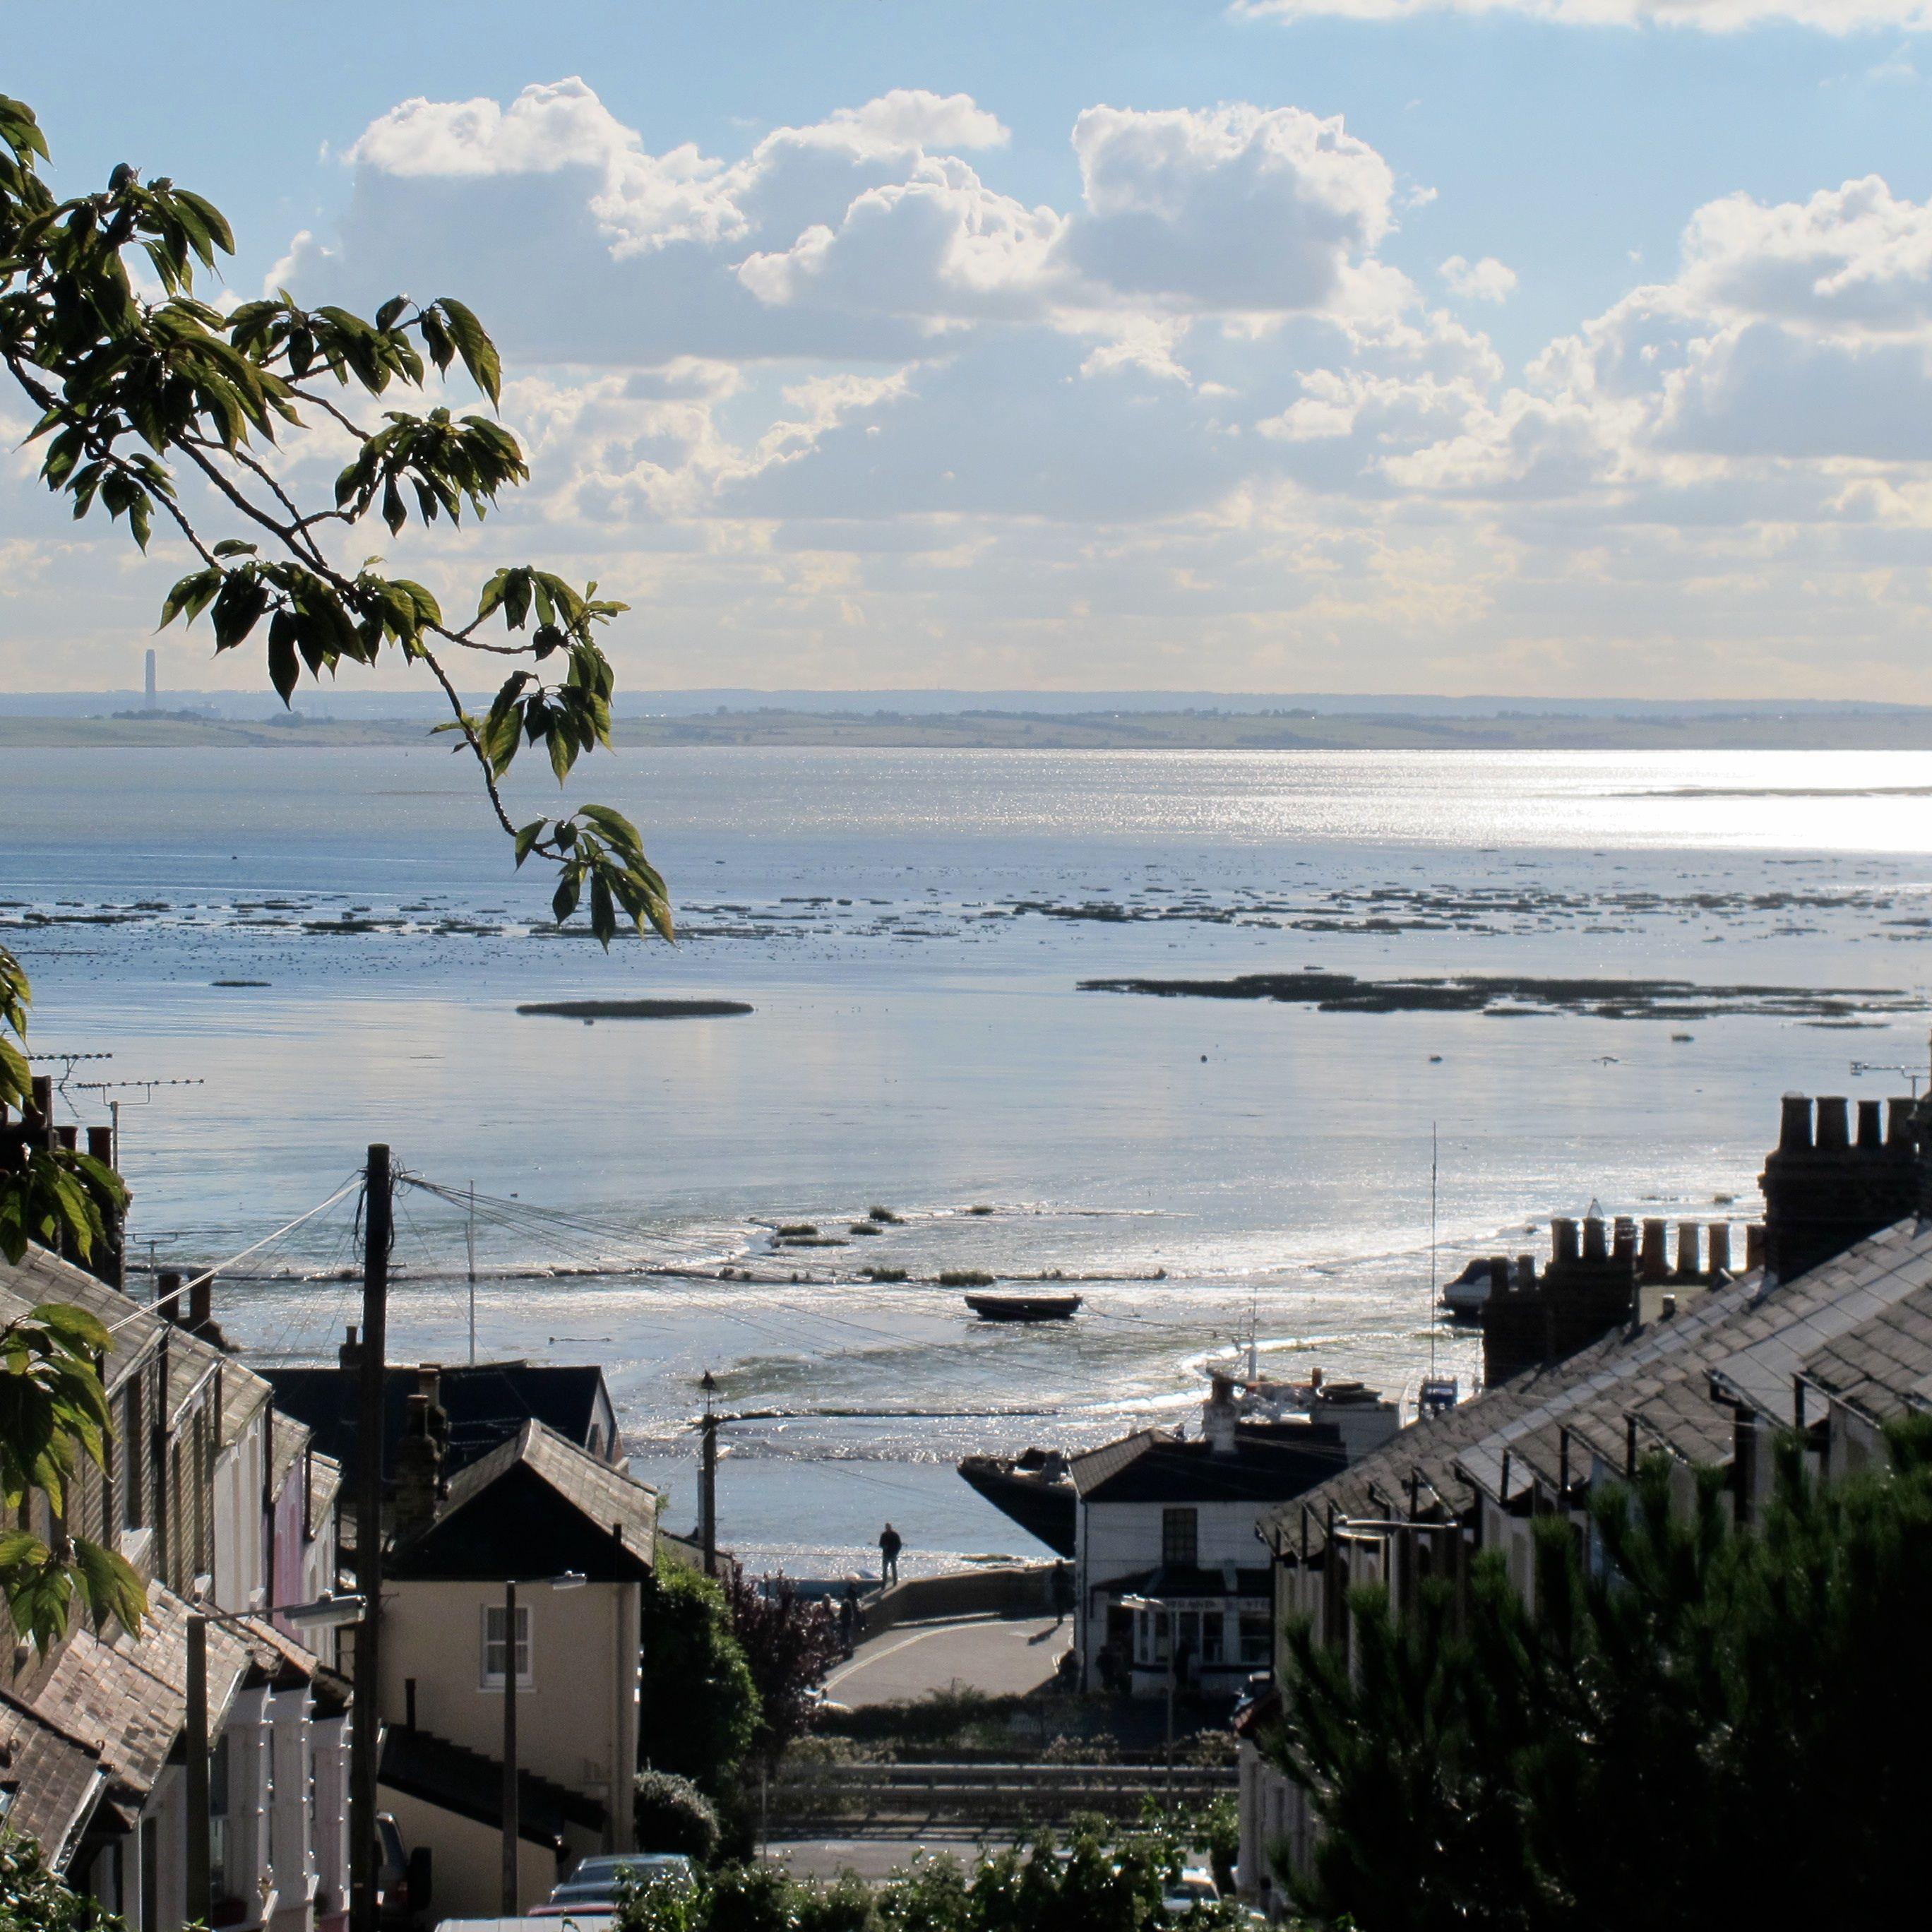 Leigh on sea essex england